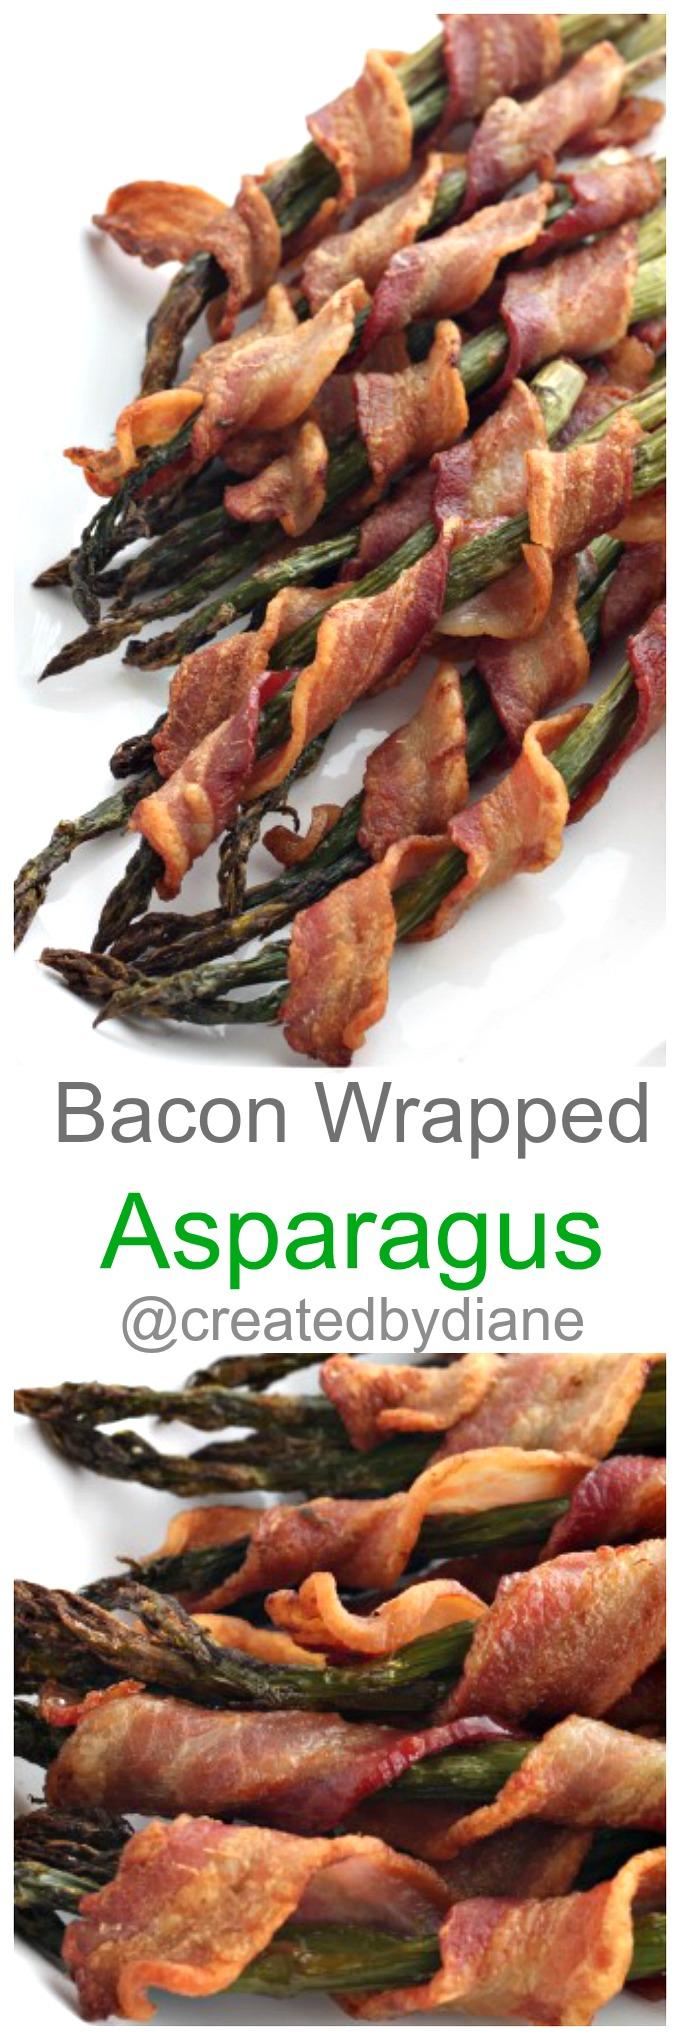 Bacon Wrapped Asparagus @createdbydiane www.createdby-diane.com